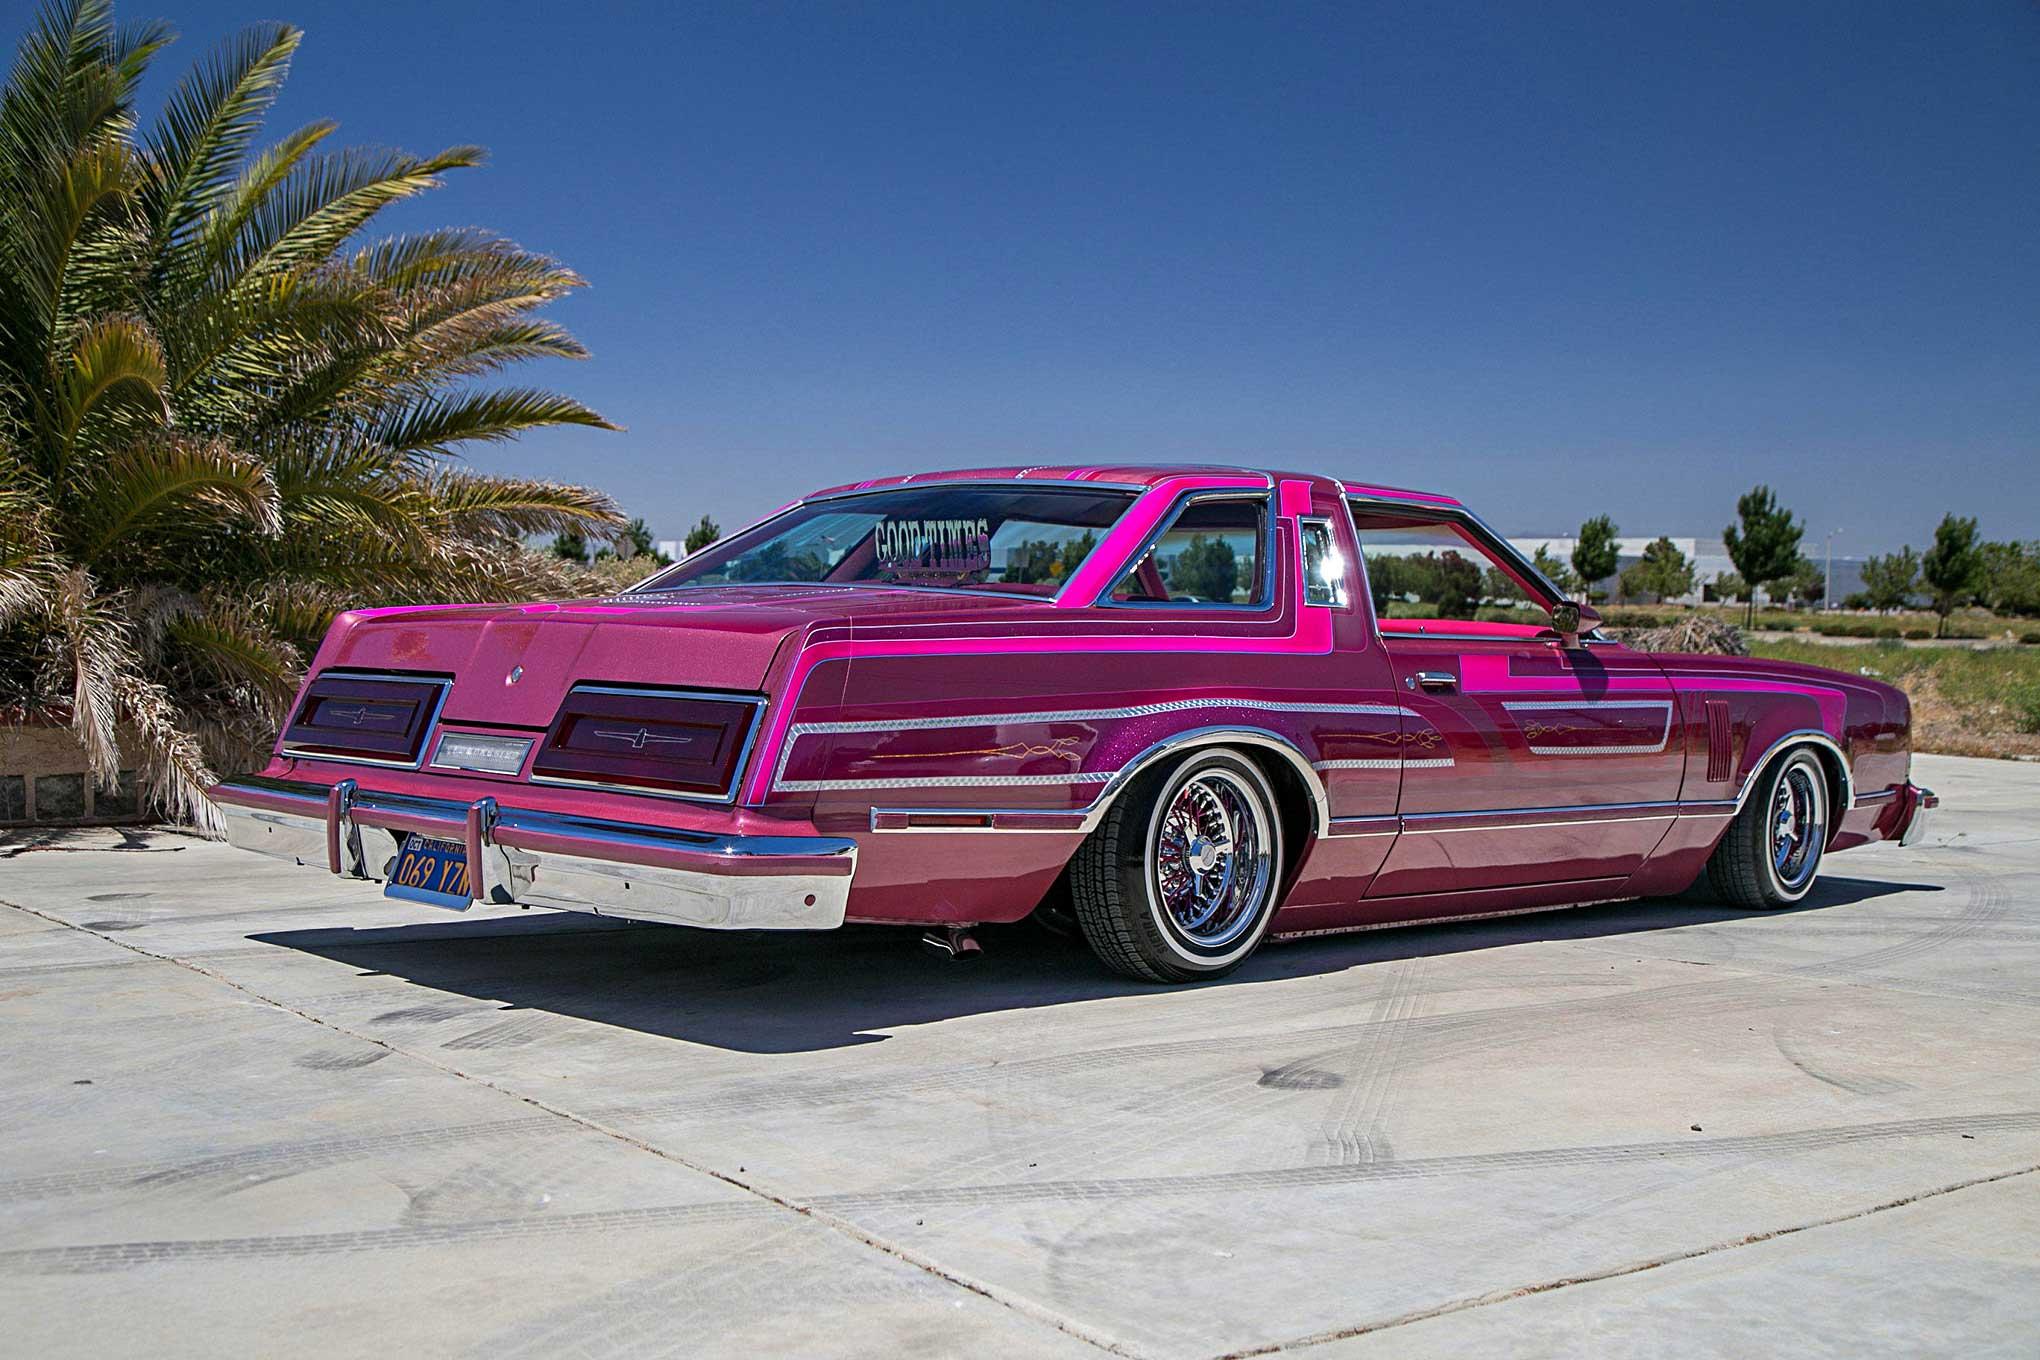 1979 Ford Thunderbird back side laid - Lowrider